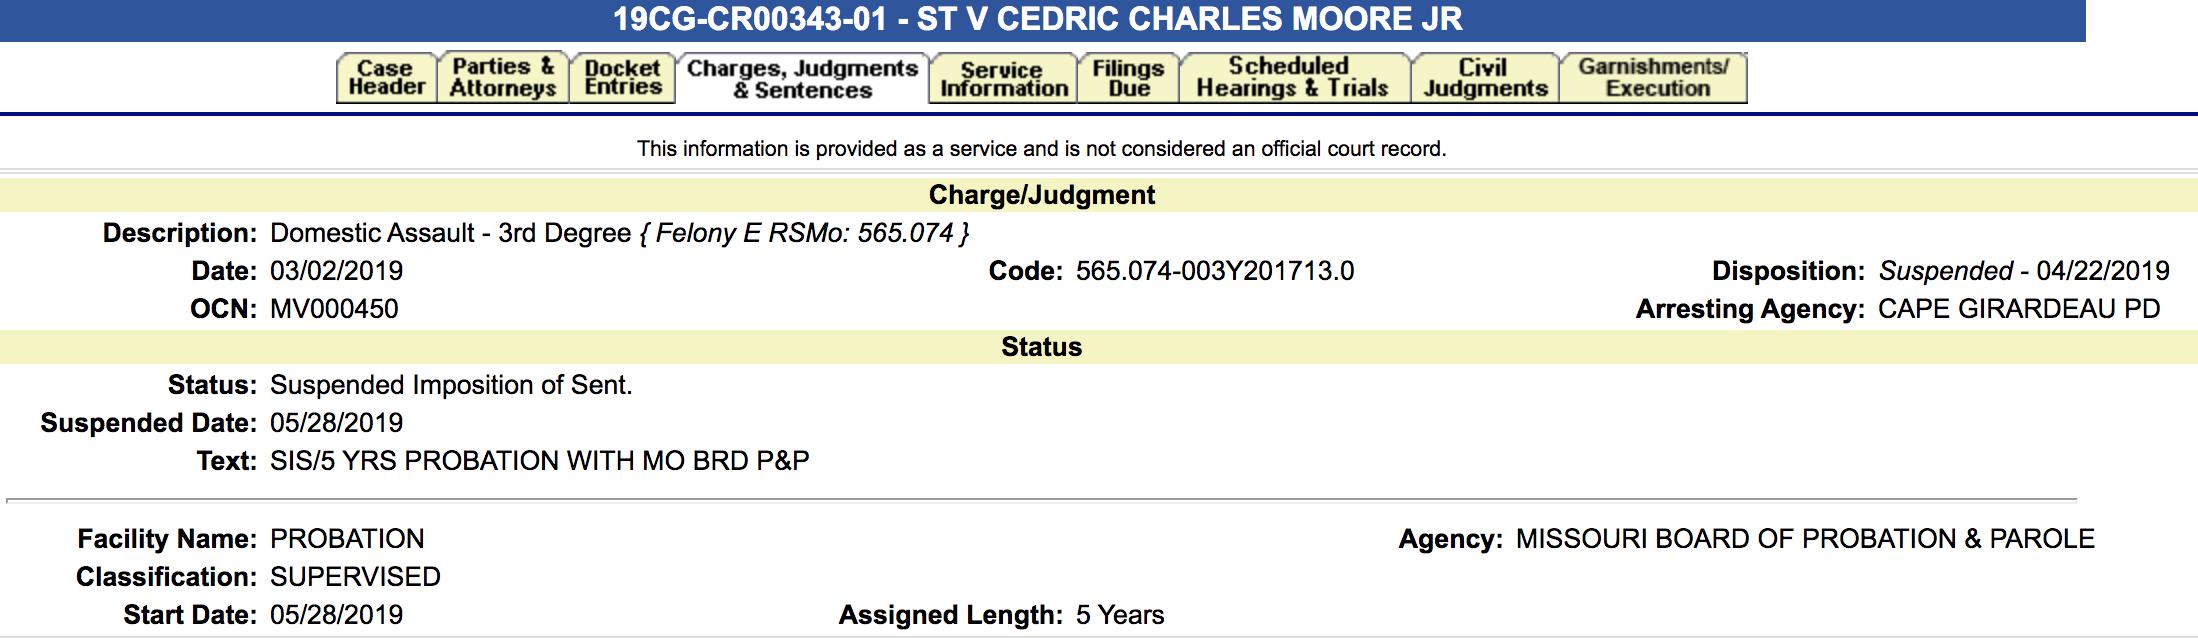 CJ Moore 2019 case